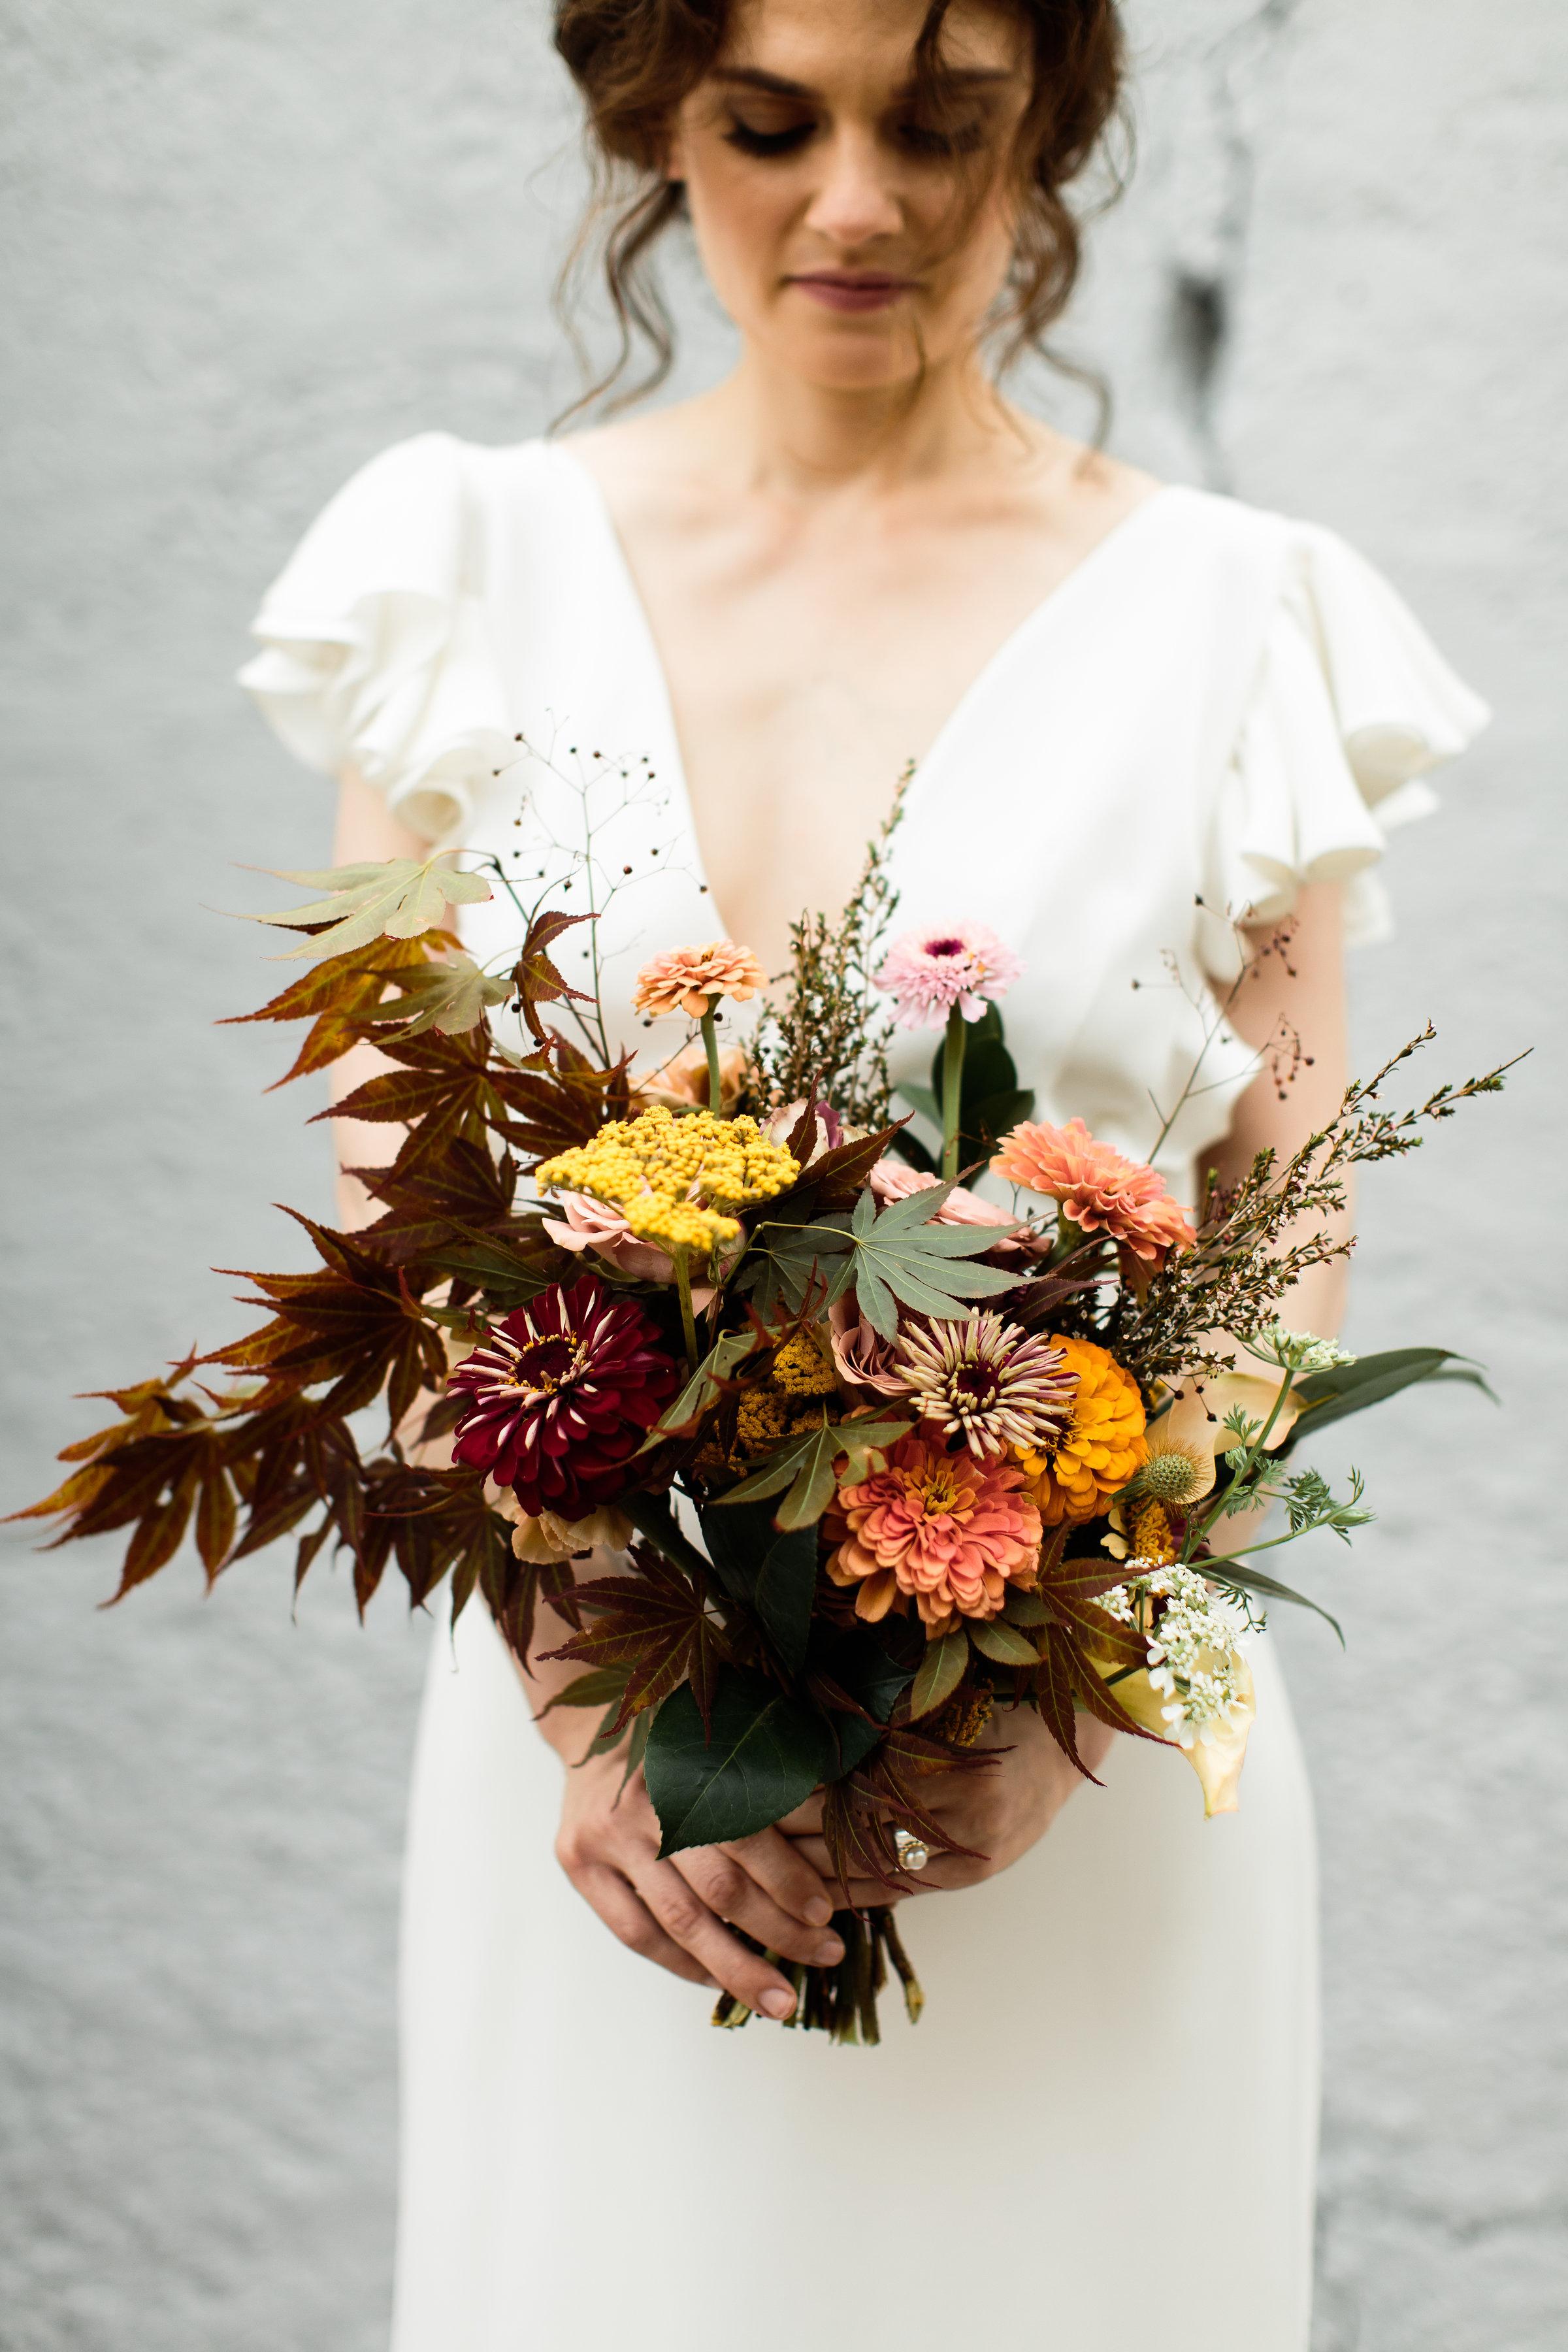 Jakkelyn Iris floral design for the brides bouquet - Pearl Weddings & Events